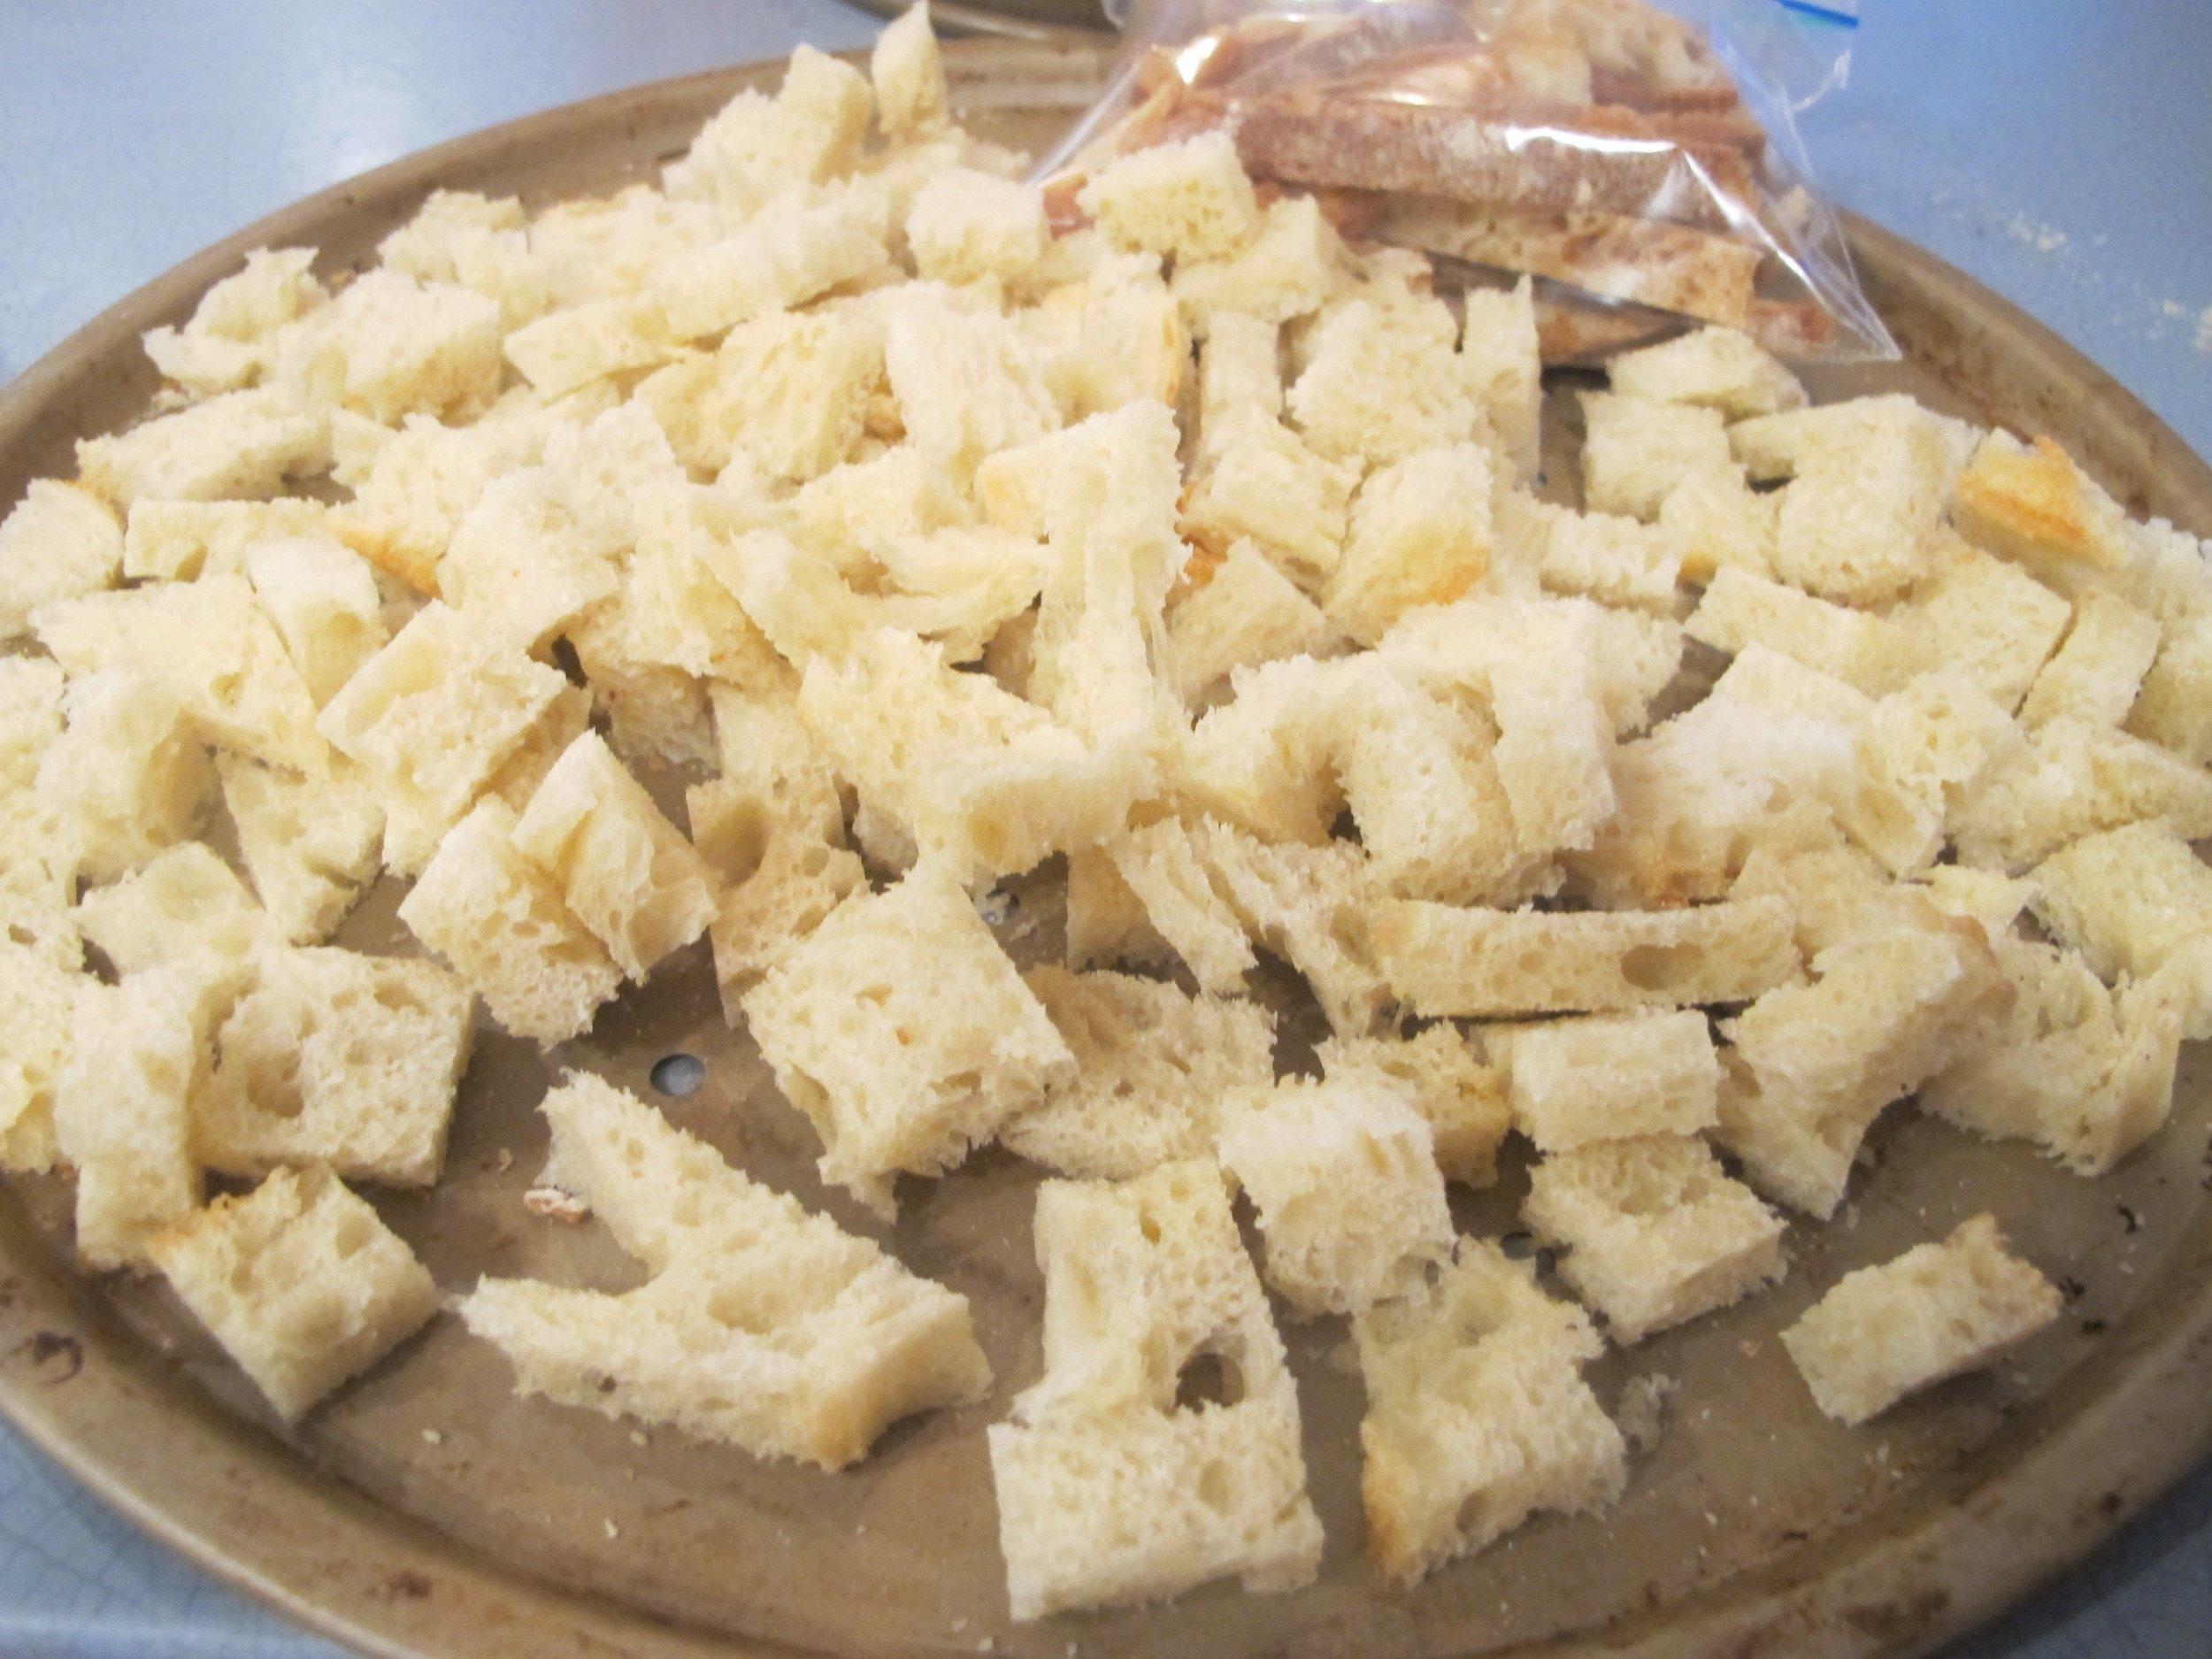 Zucca_al_Forno_Roasted_Pumpkin_with_Cheese-Mushroom_5.JPG